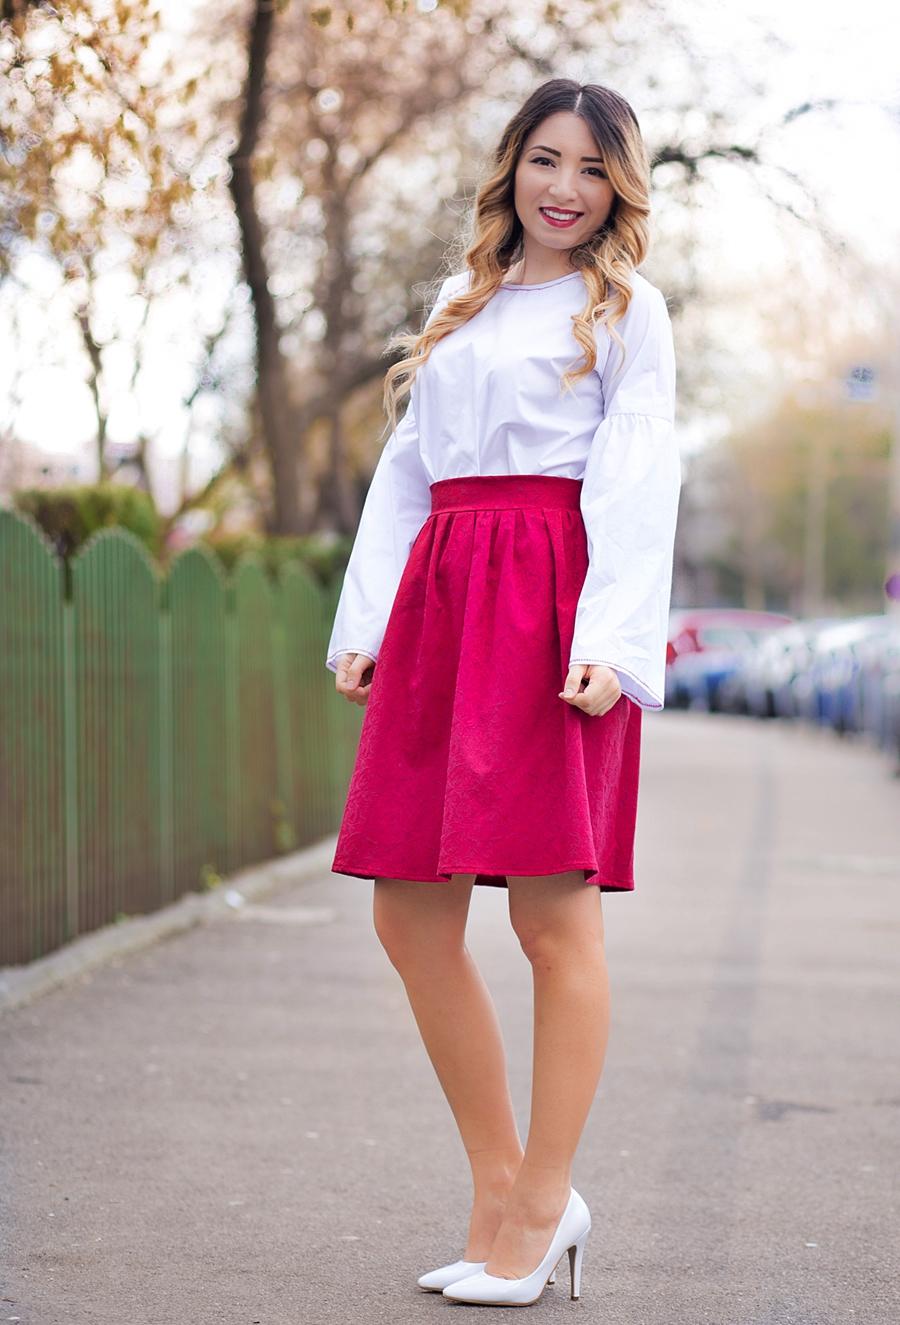 Bluza inspirata din folclorul traditional romanesc